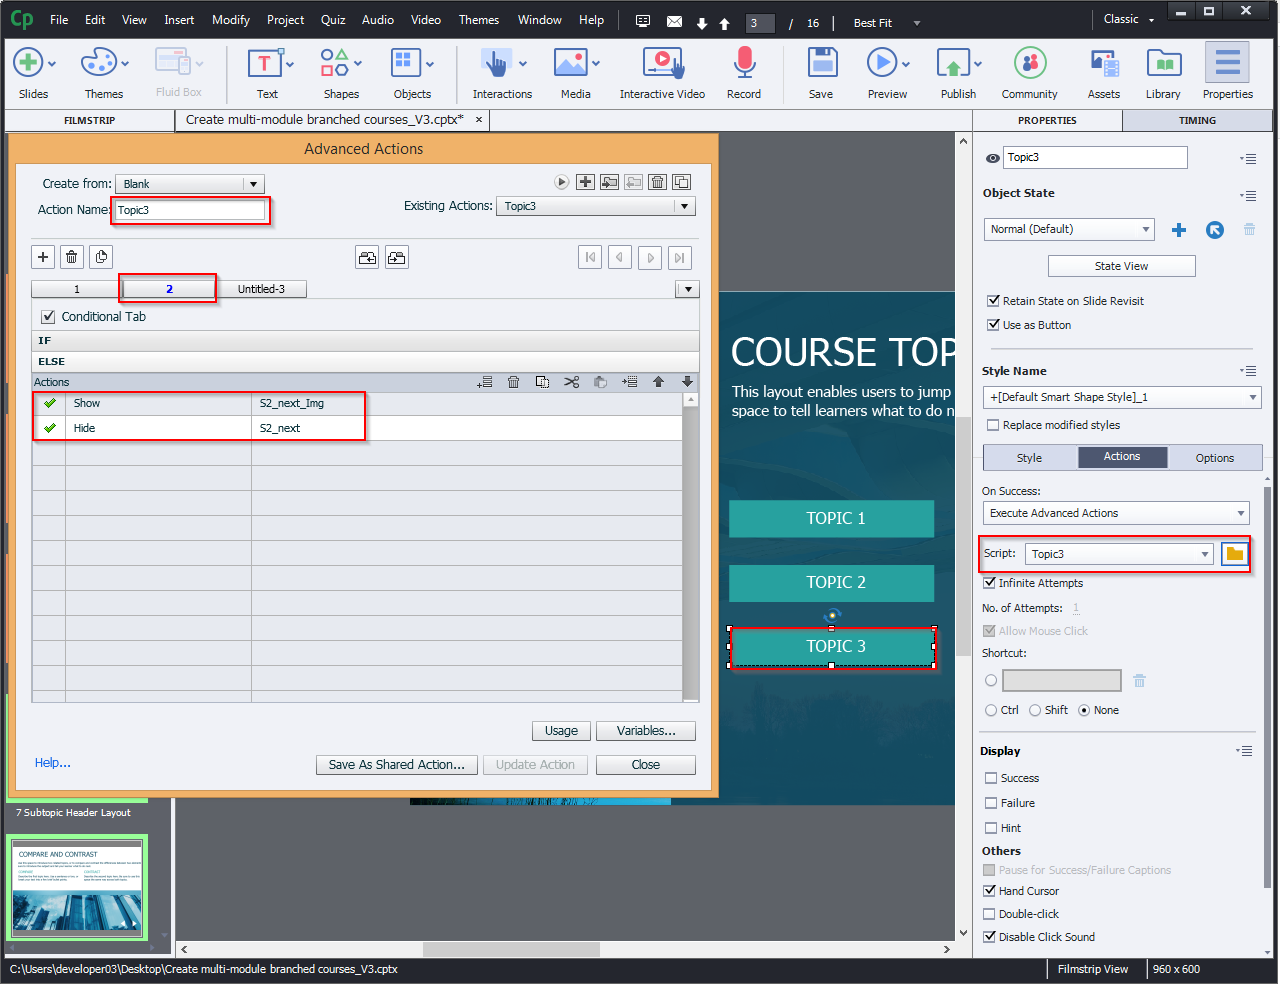 Create multi-module branched courses 10.8